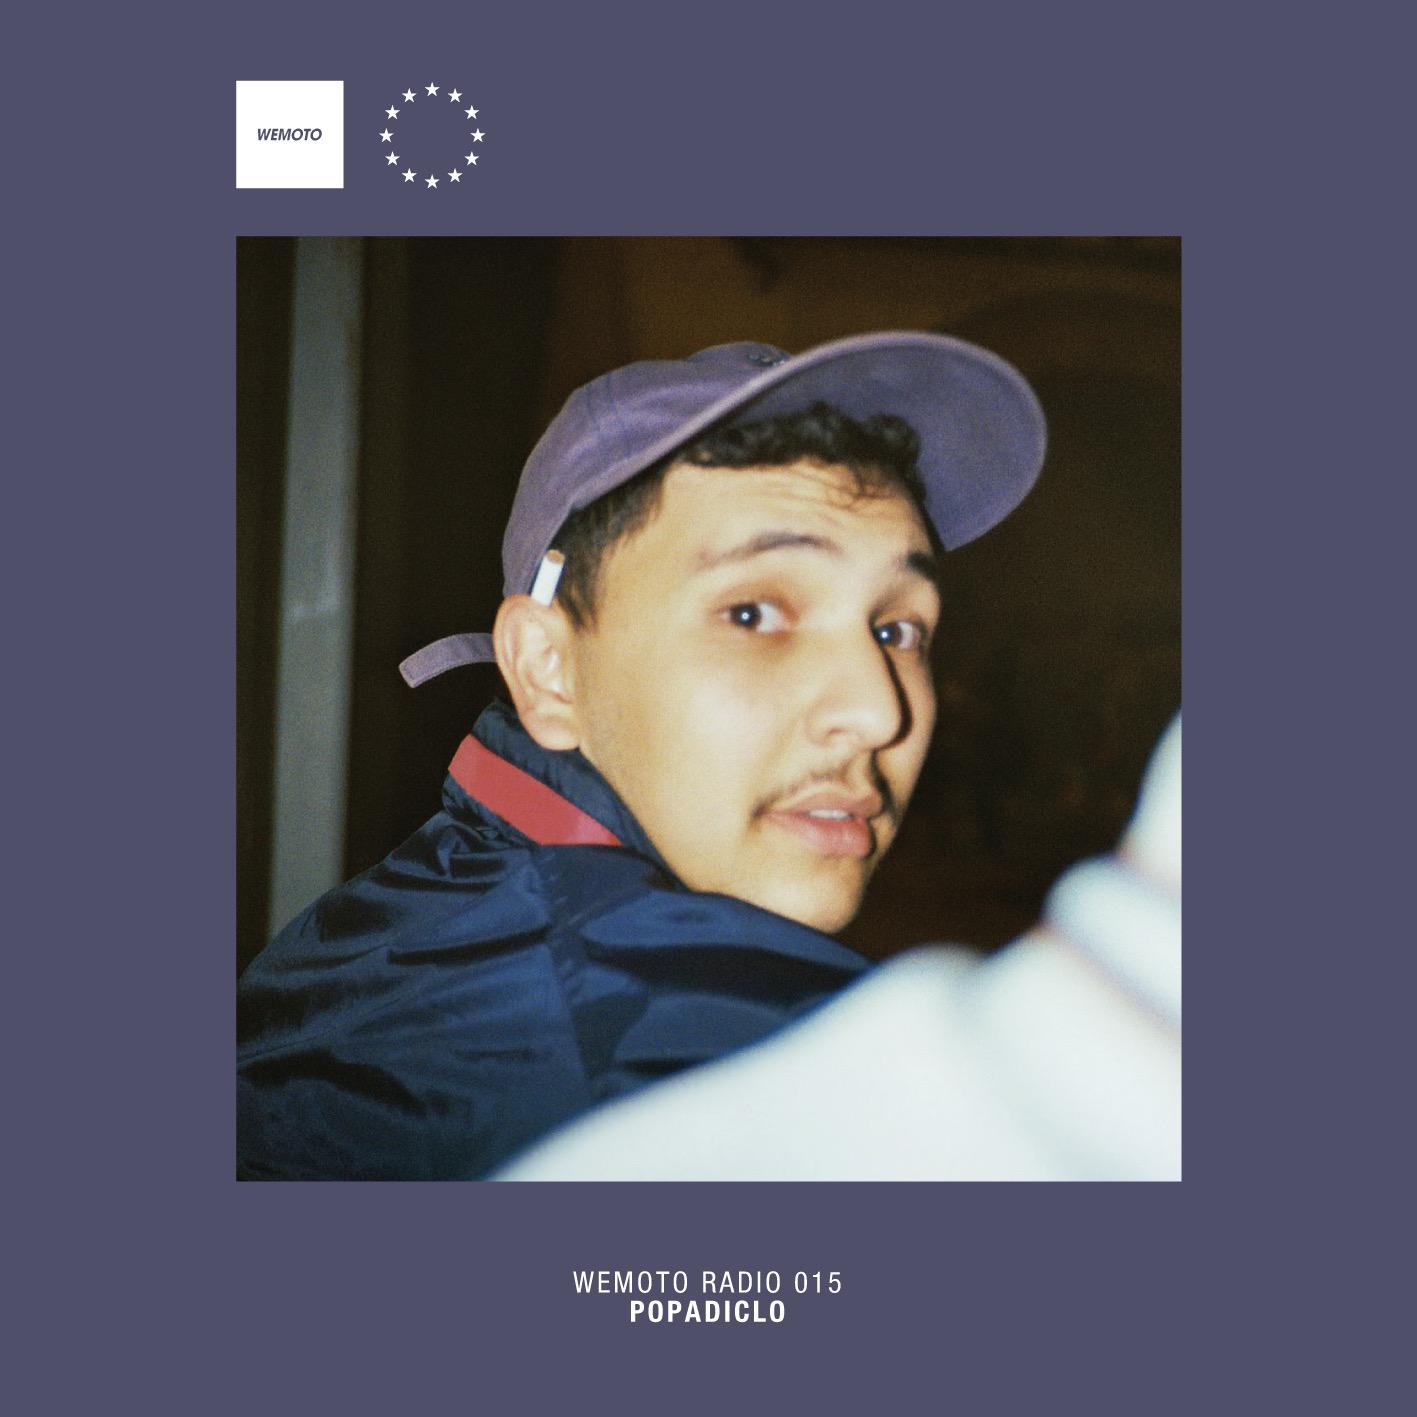 Wemoto-Podcast-Cover-15-PopadicloFECHFJwtldFB6